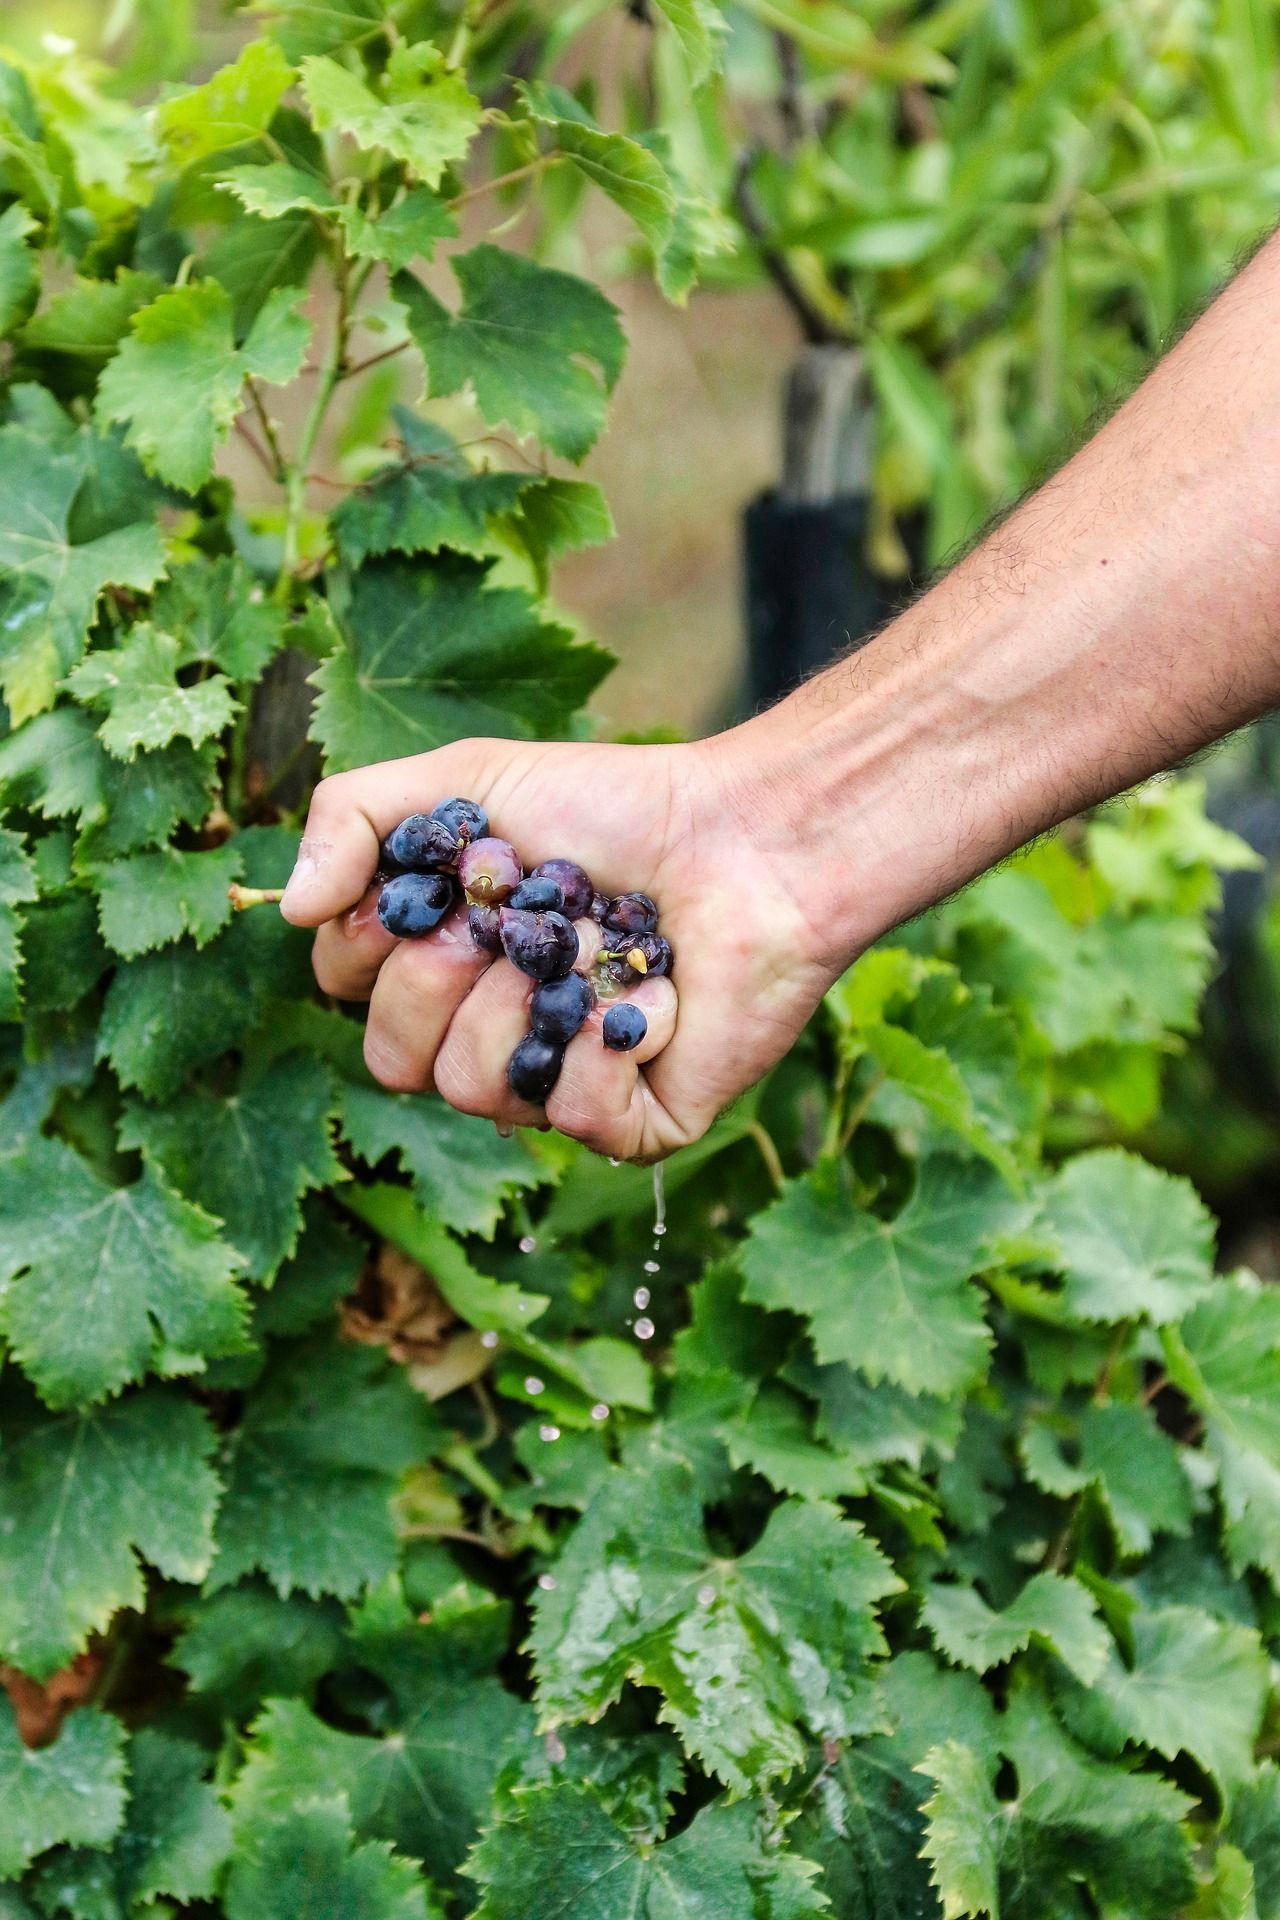 Hand squeezing grapes; WSET Level 3 exam